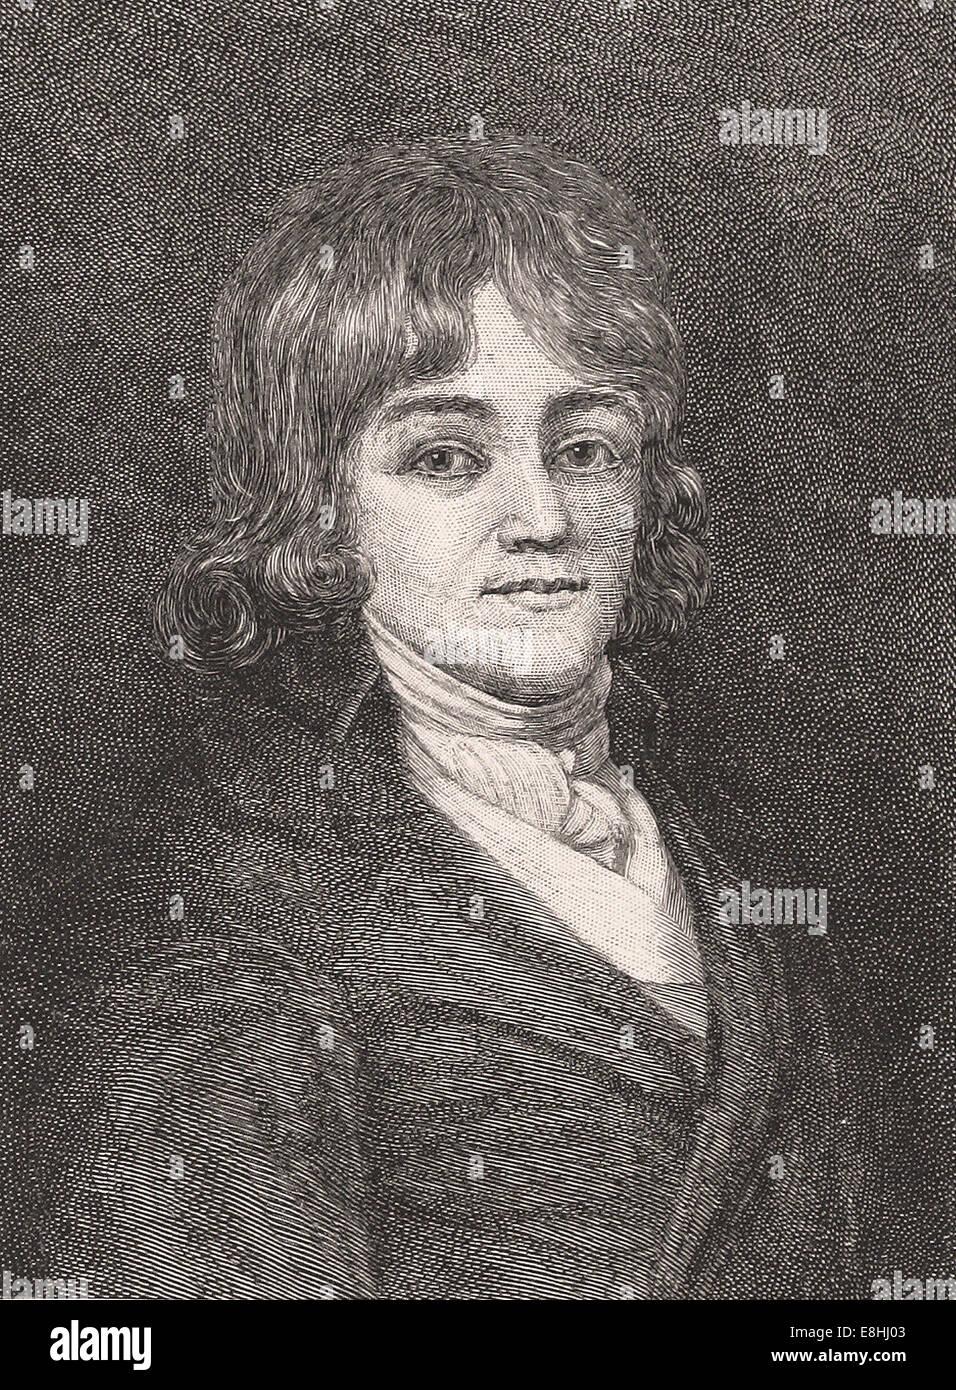 Portrait of Francis Scott Key at seventeen - Engraving - XIX th Century - Stock Image